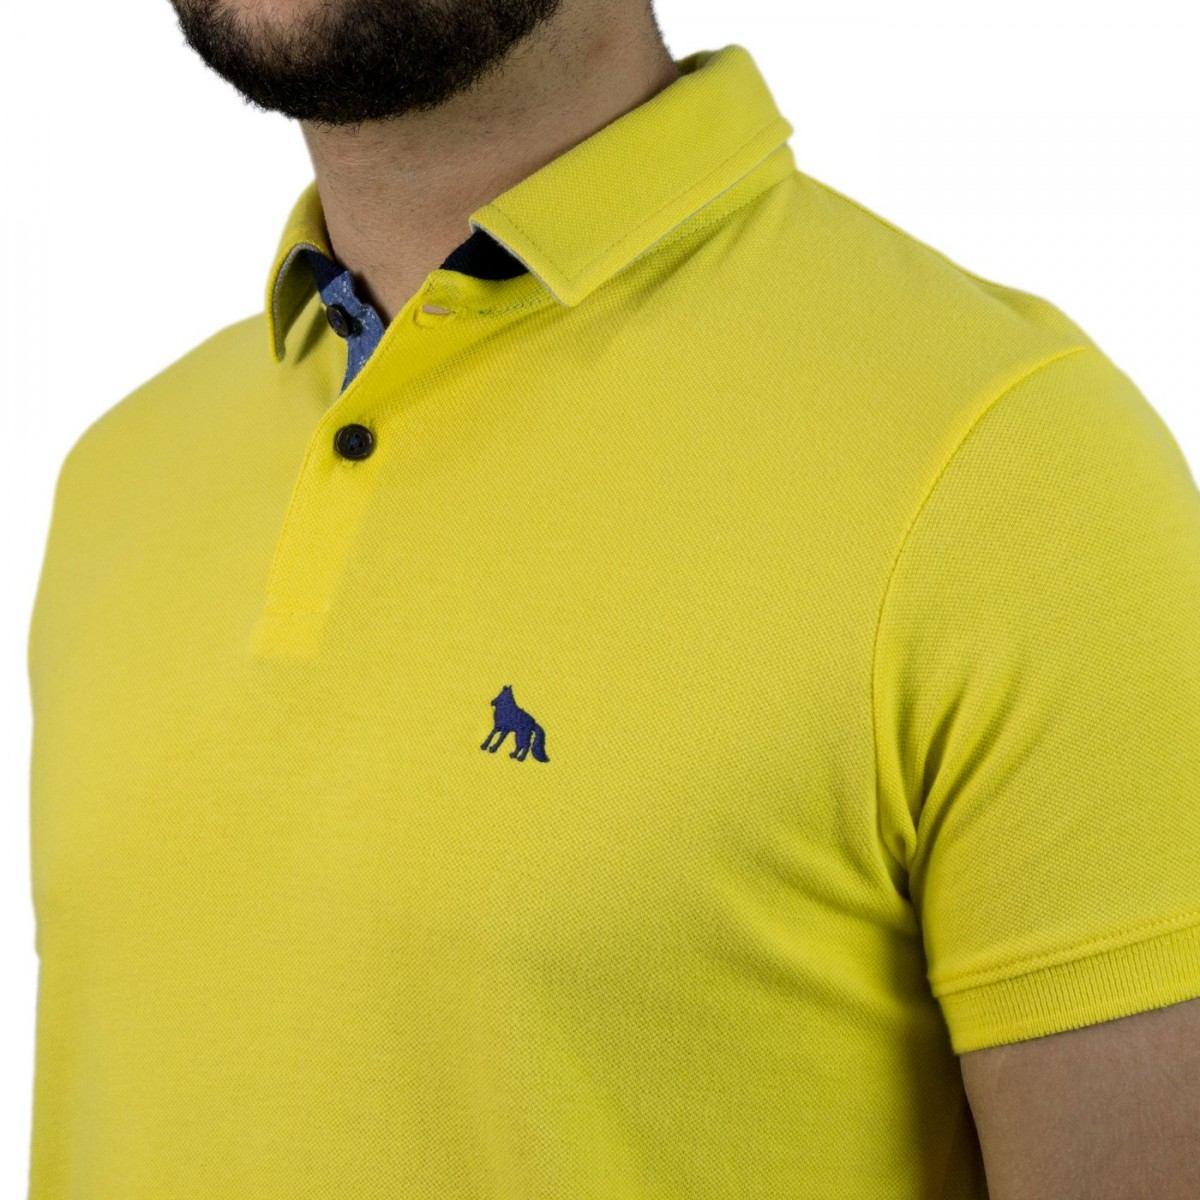 01bd04ae2 camisa polo masculina acostamento manga curta 68104063. Carregando zoom.